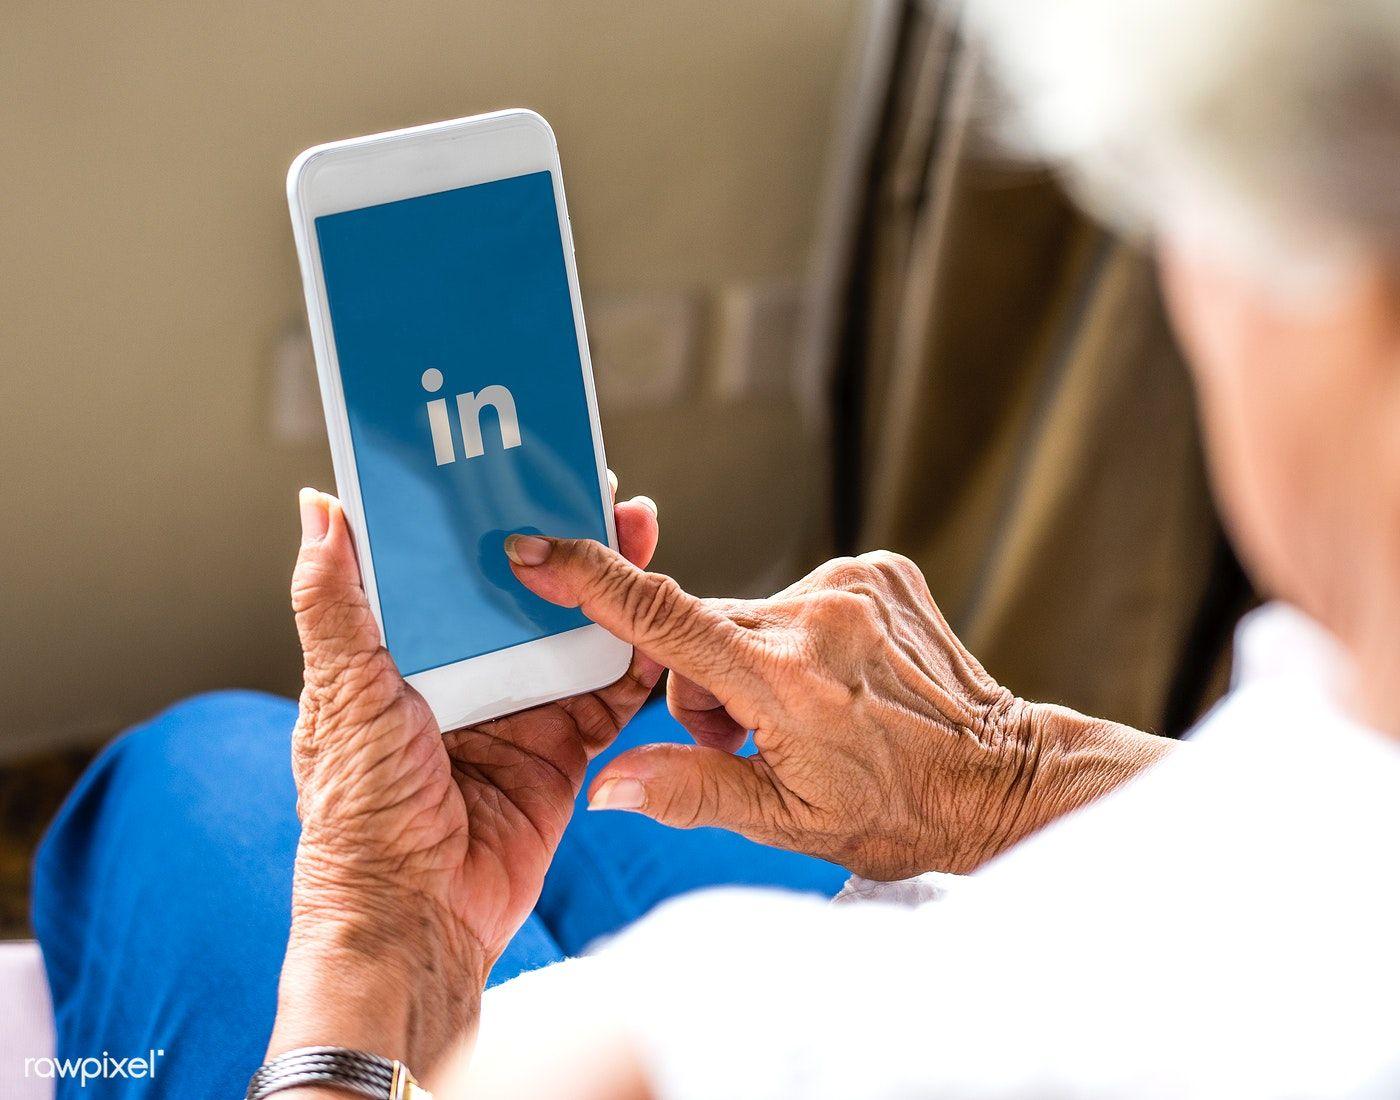 Elderly woman using linkedin application on a mobile phone